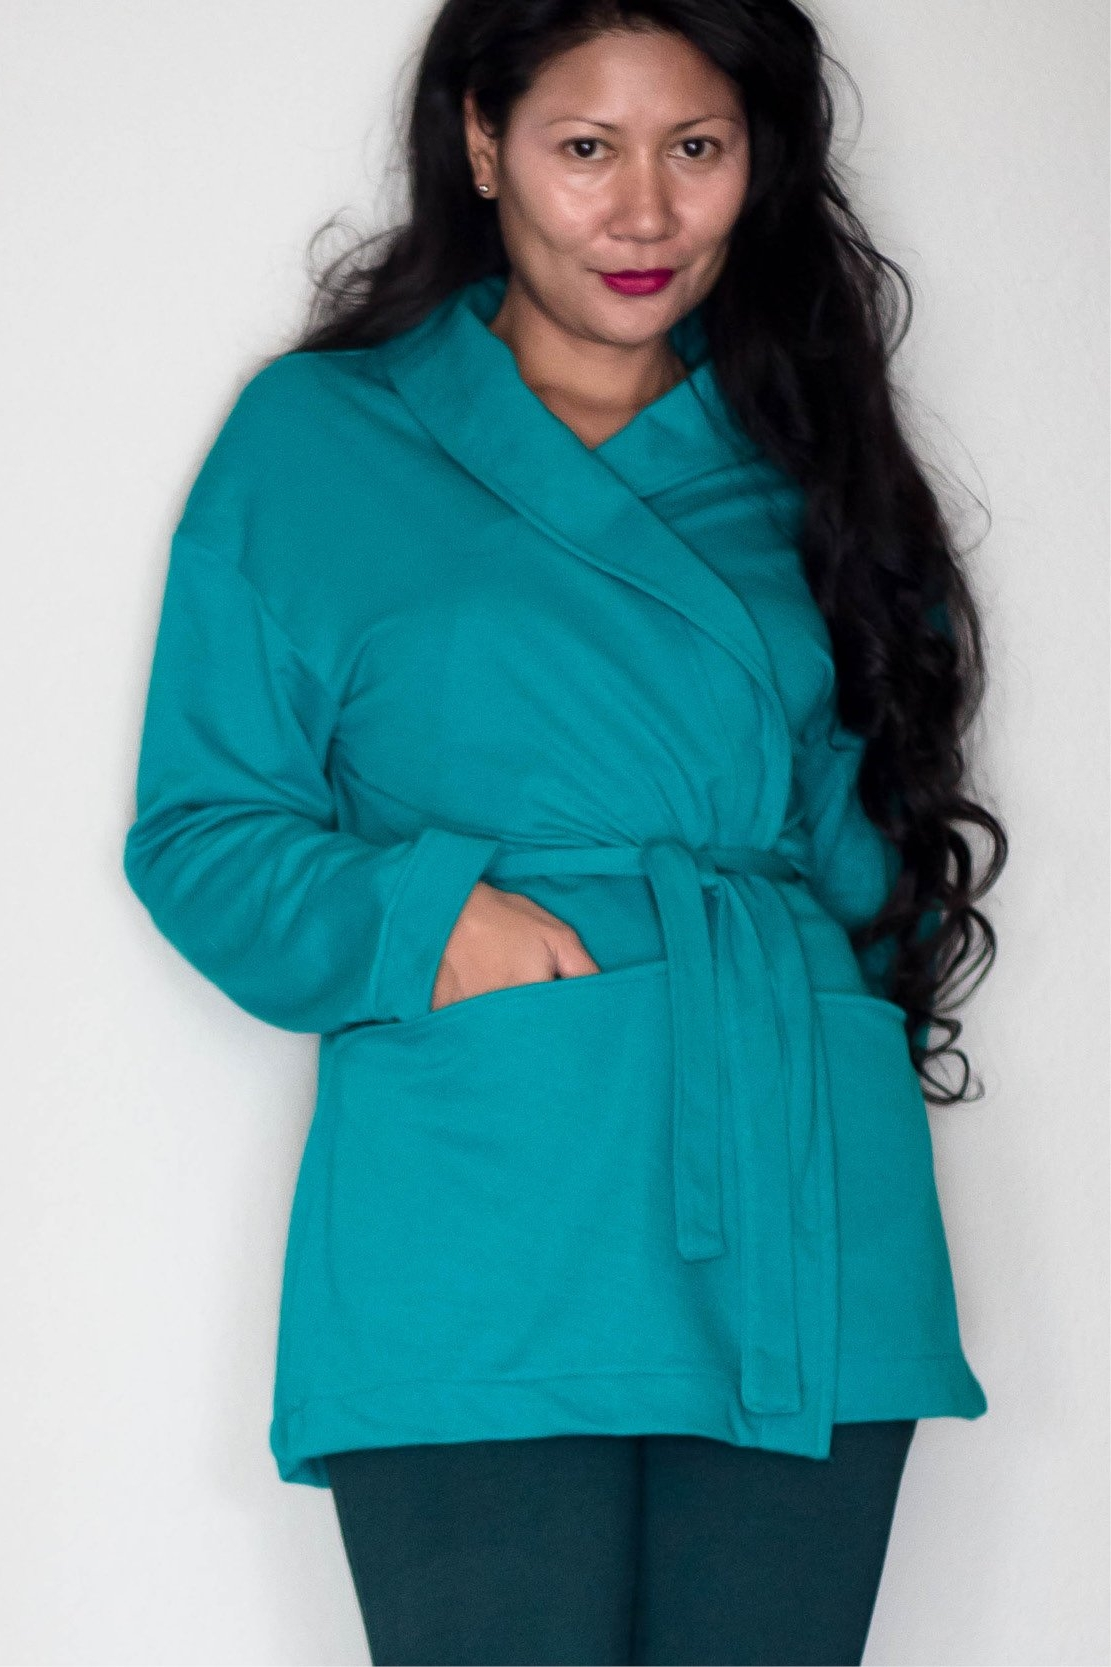 Komi Kimono Jacket by Wardrobe by Me